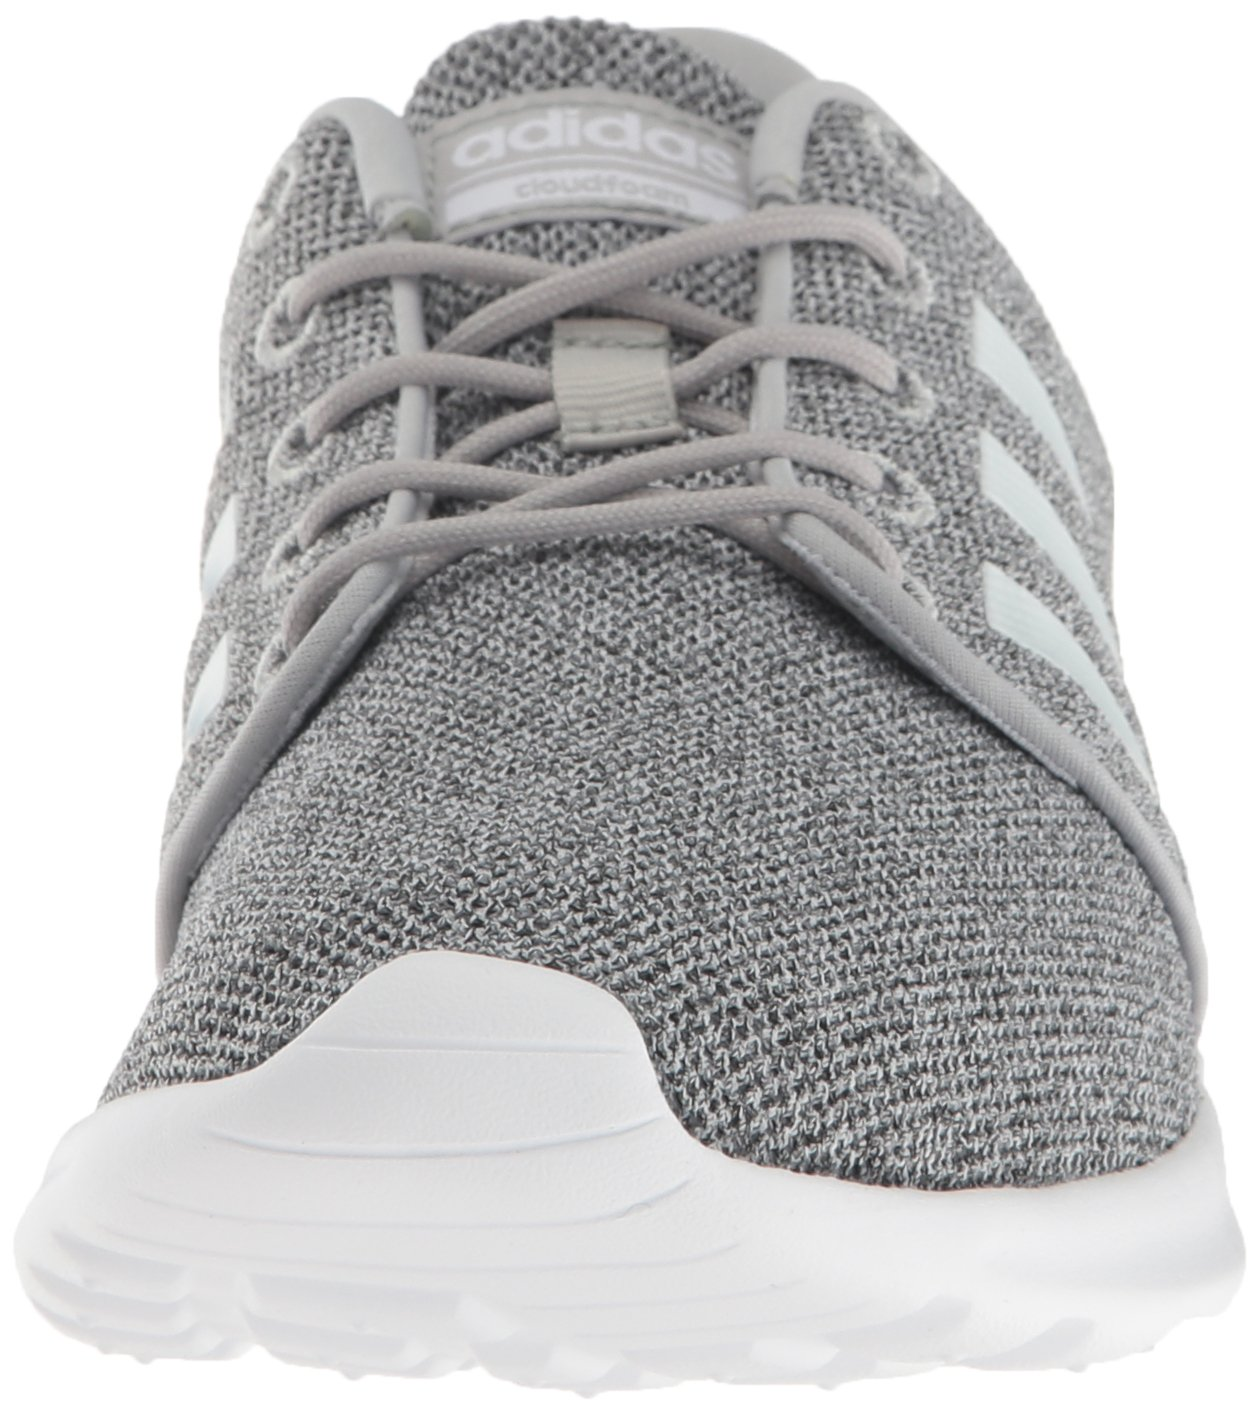 adidas Women's Cloudfoam Qt Racer w Running Shoe, Clear Onix/White/Light Onix, 5 M US by adidas (Image #4)